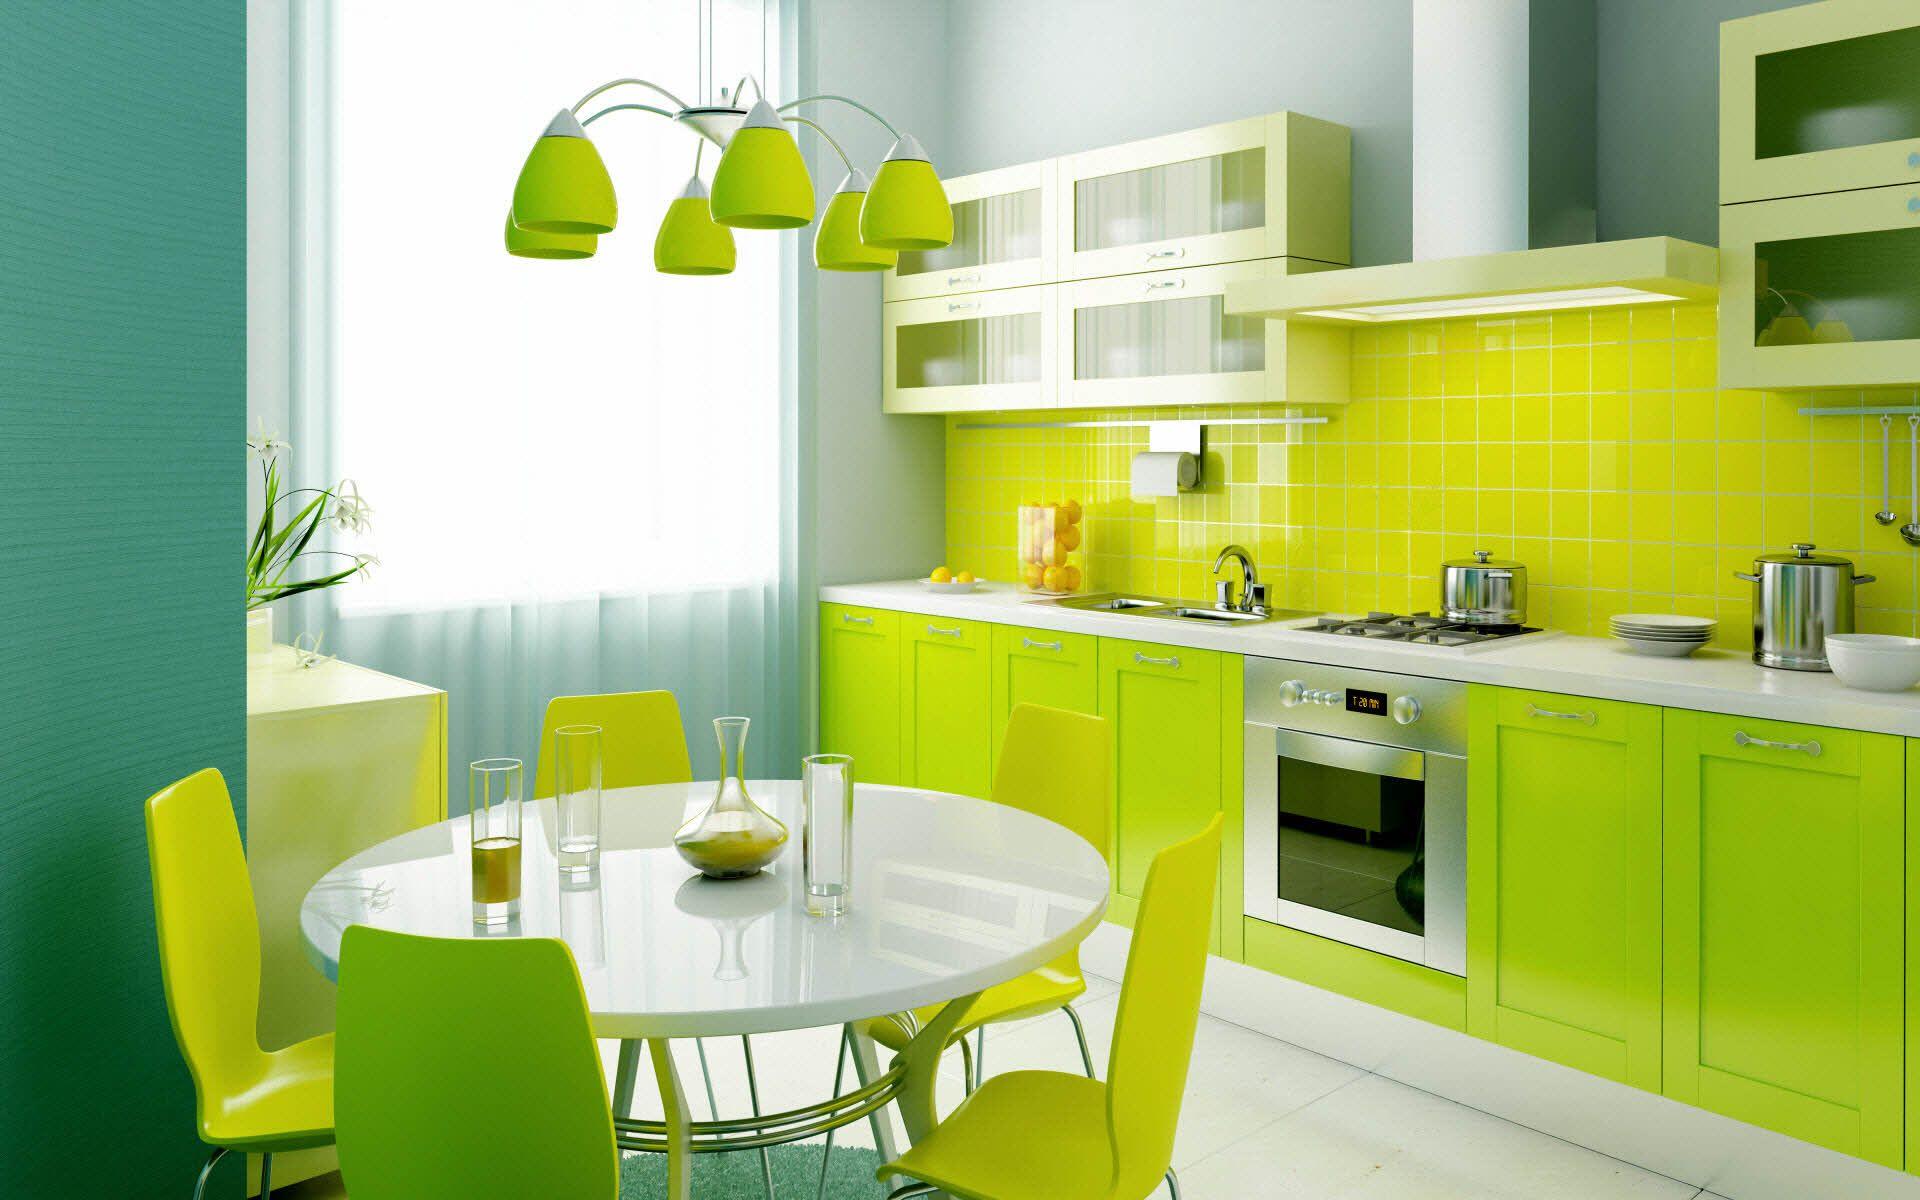 minimalist green kitchen interior kabinet dapur model dapur ide dekorasi rumah on kitchen interior green id=81147